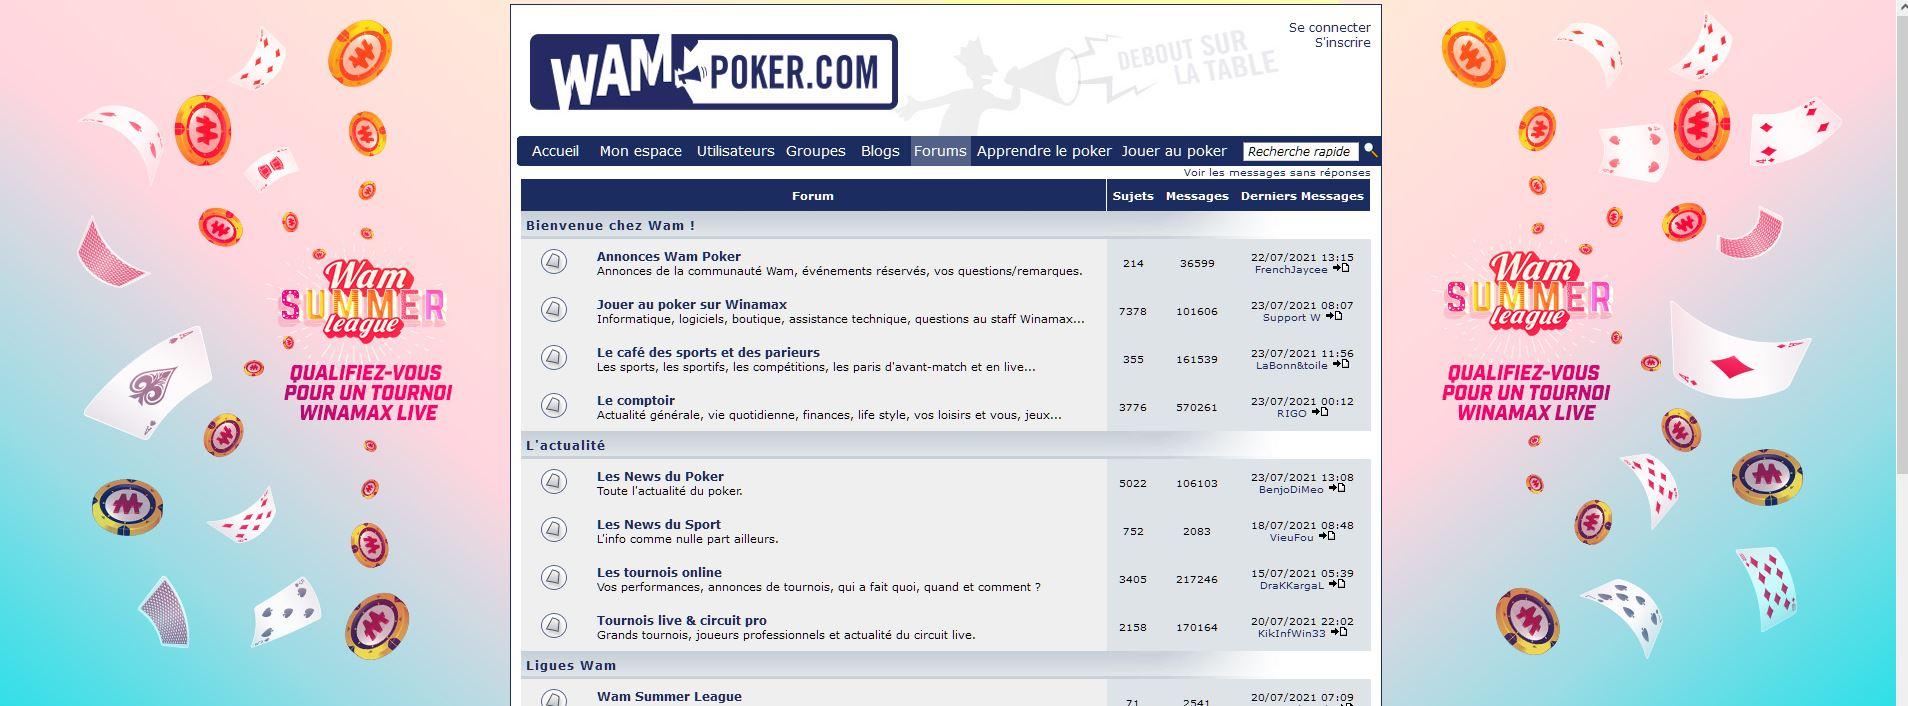 Wam Poker